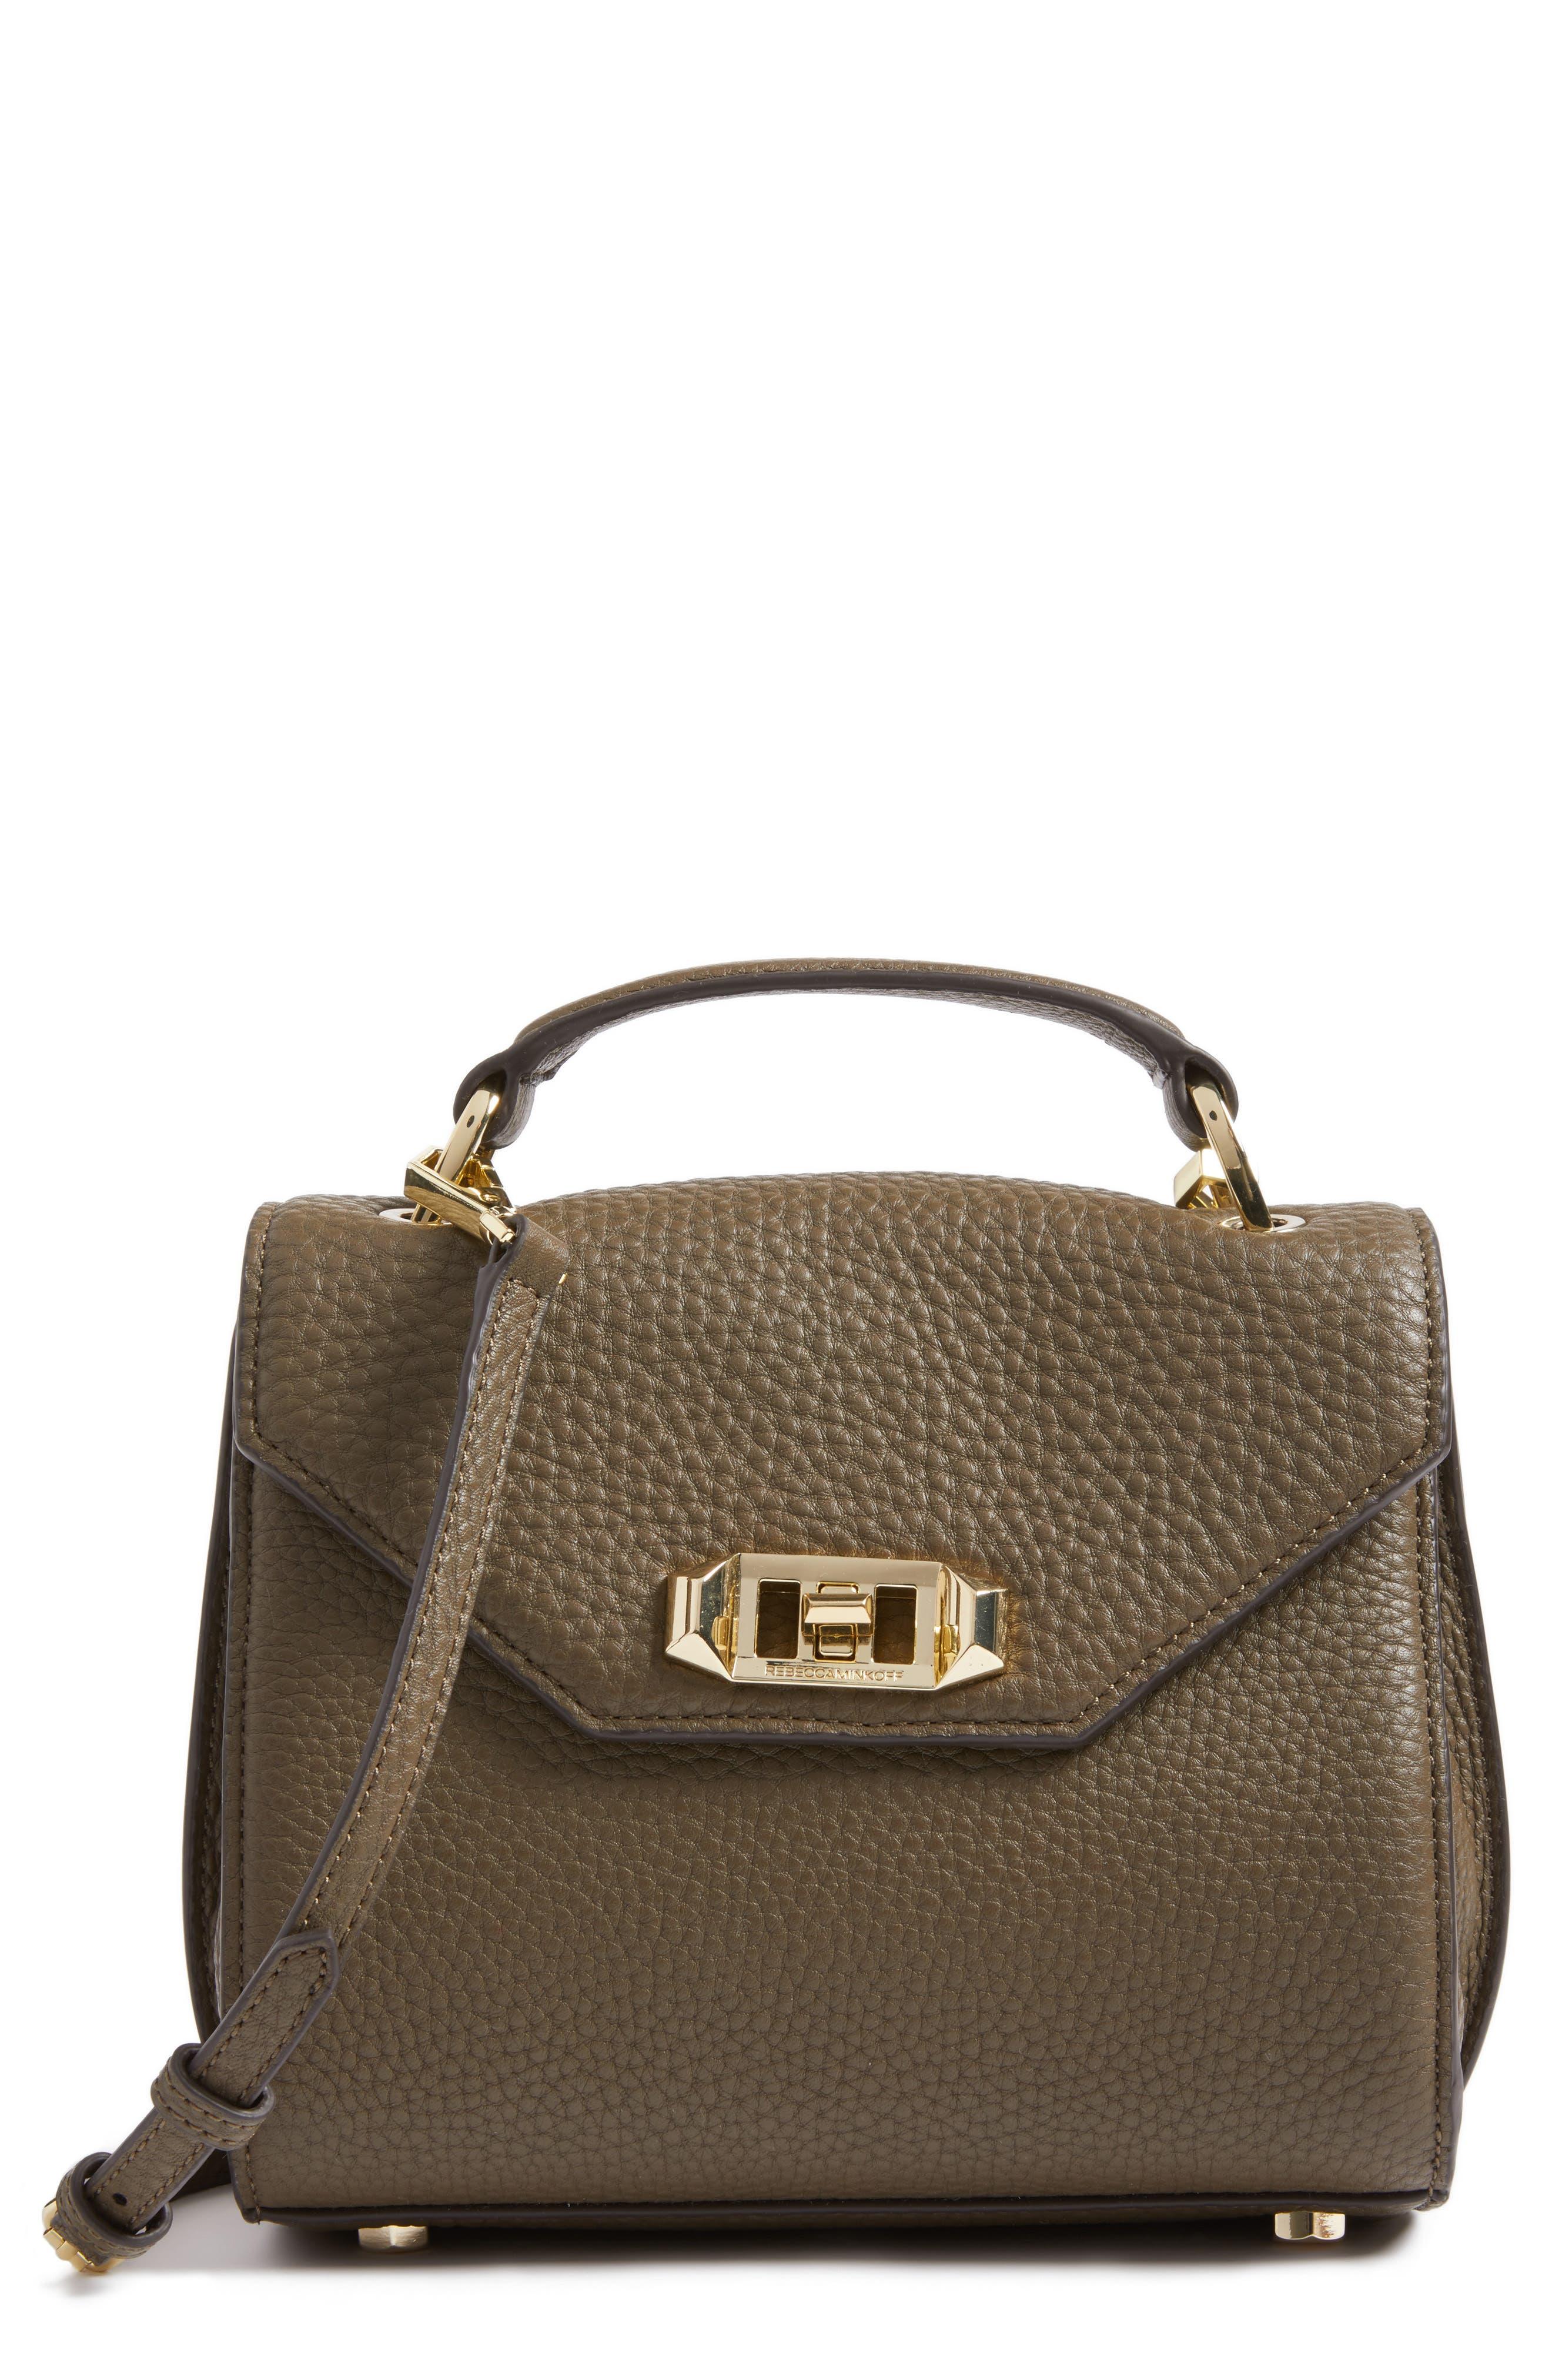 REBECCA MINKOFF Top Handle Leather Satchel